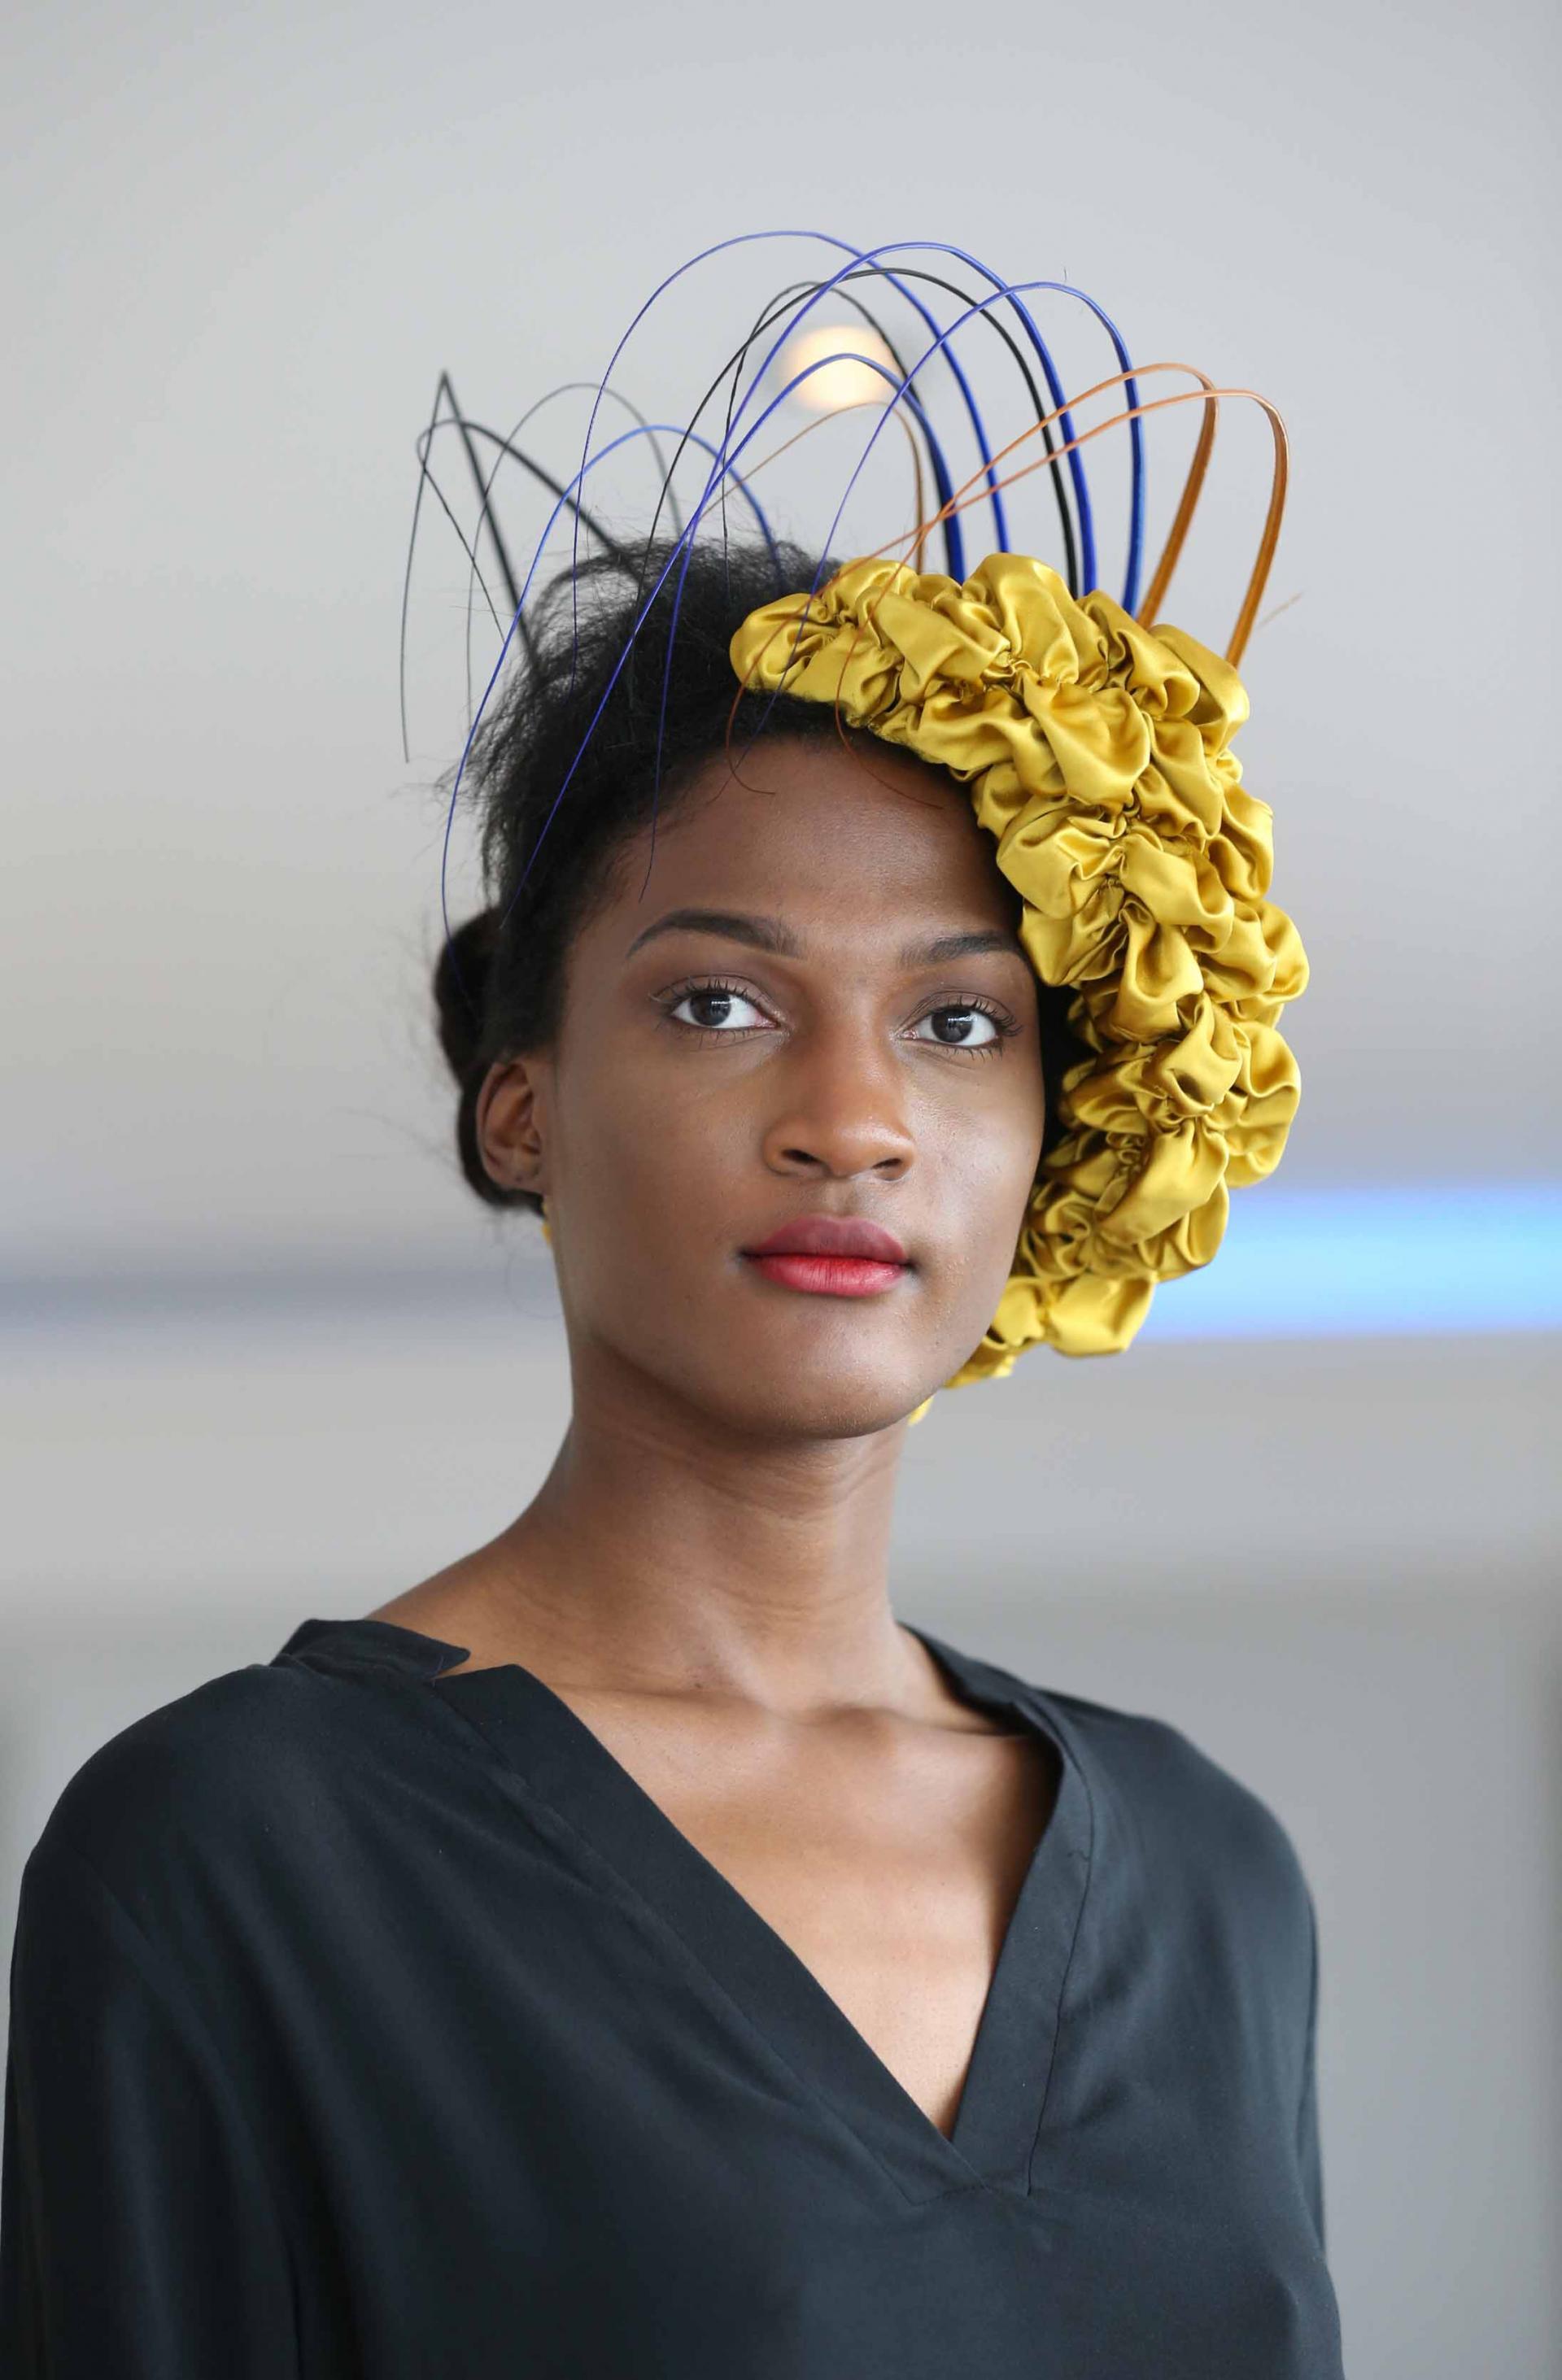 Council Of Irish Fashion Designers Aw16 Presentation Floralesque